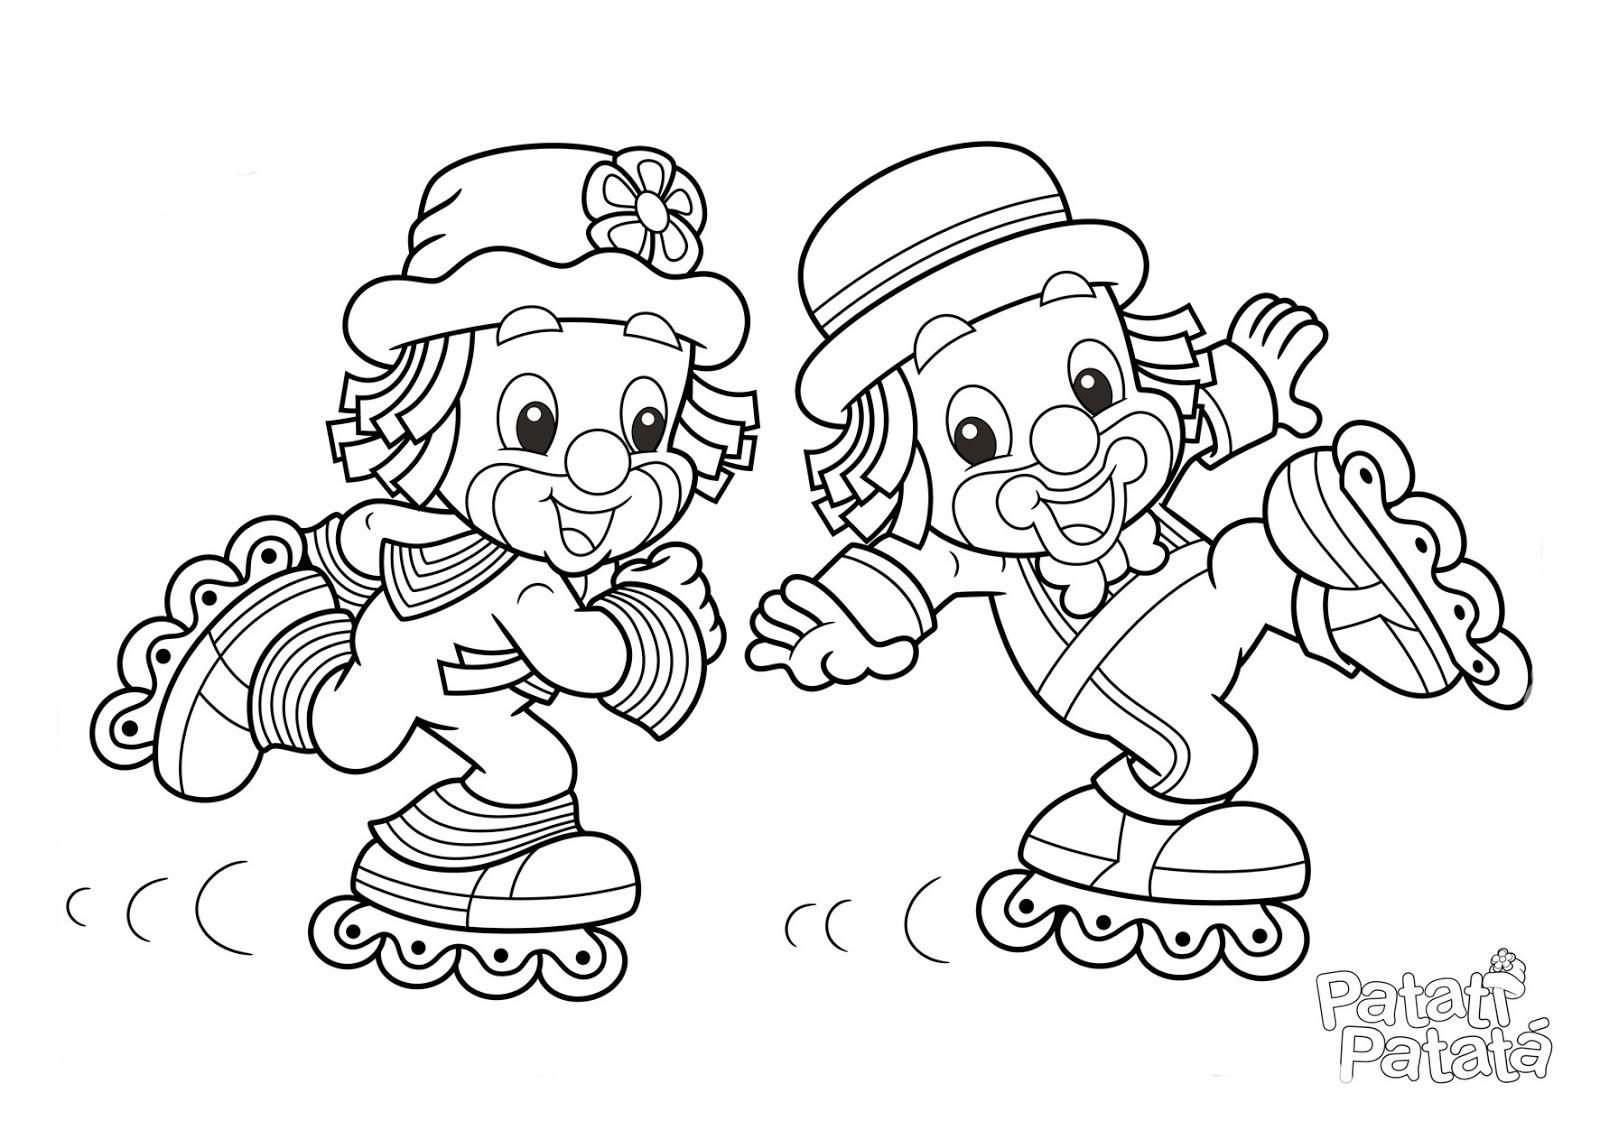 Desenhos Do Patati Patata Para Pintar Colorir Imprimir Moldes E